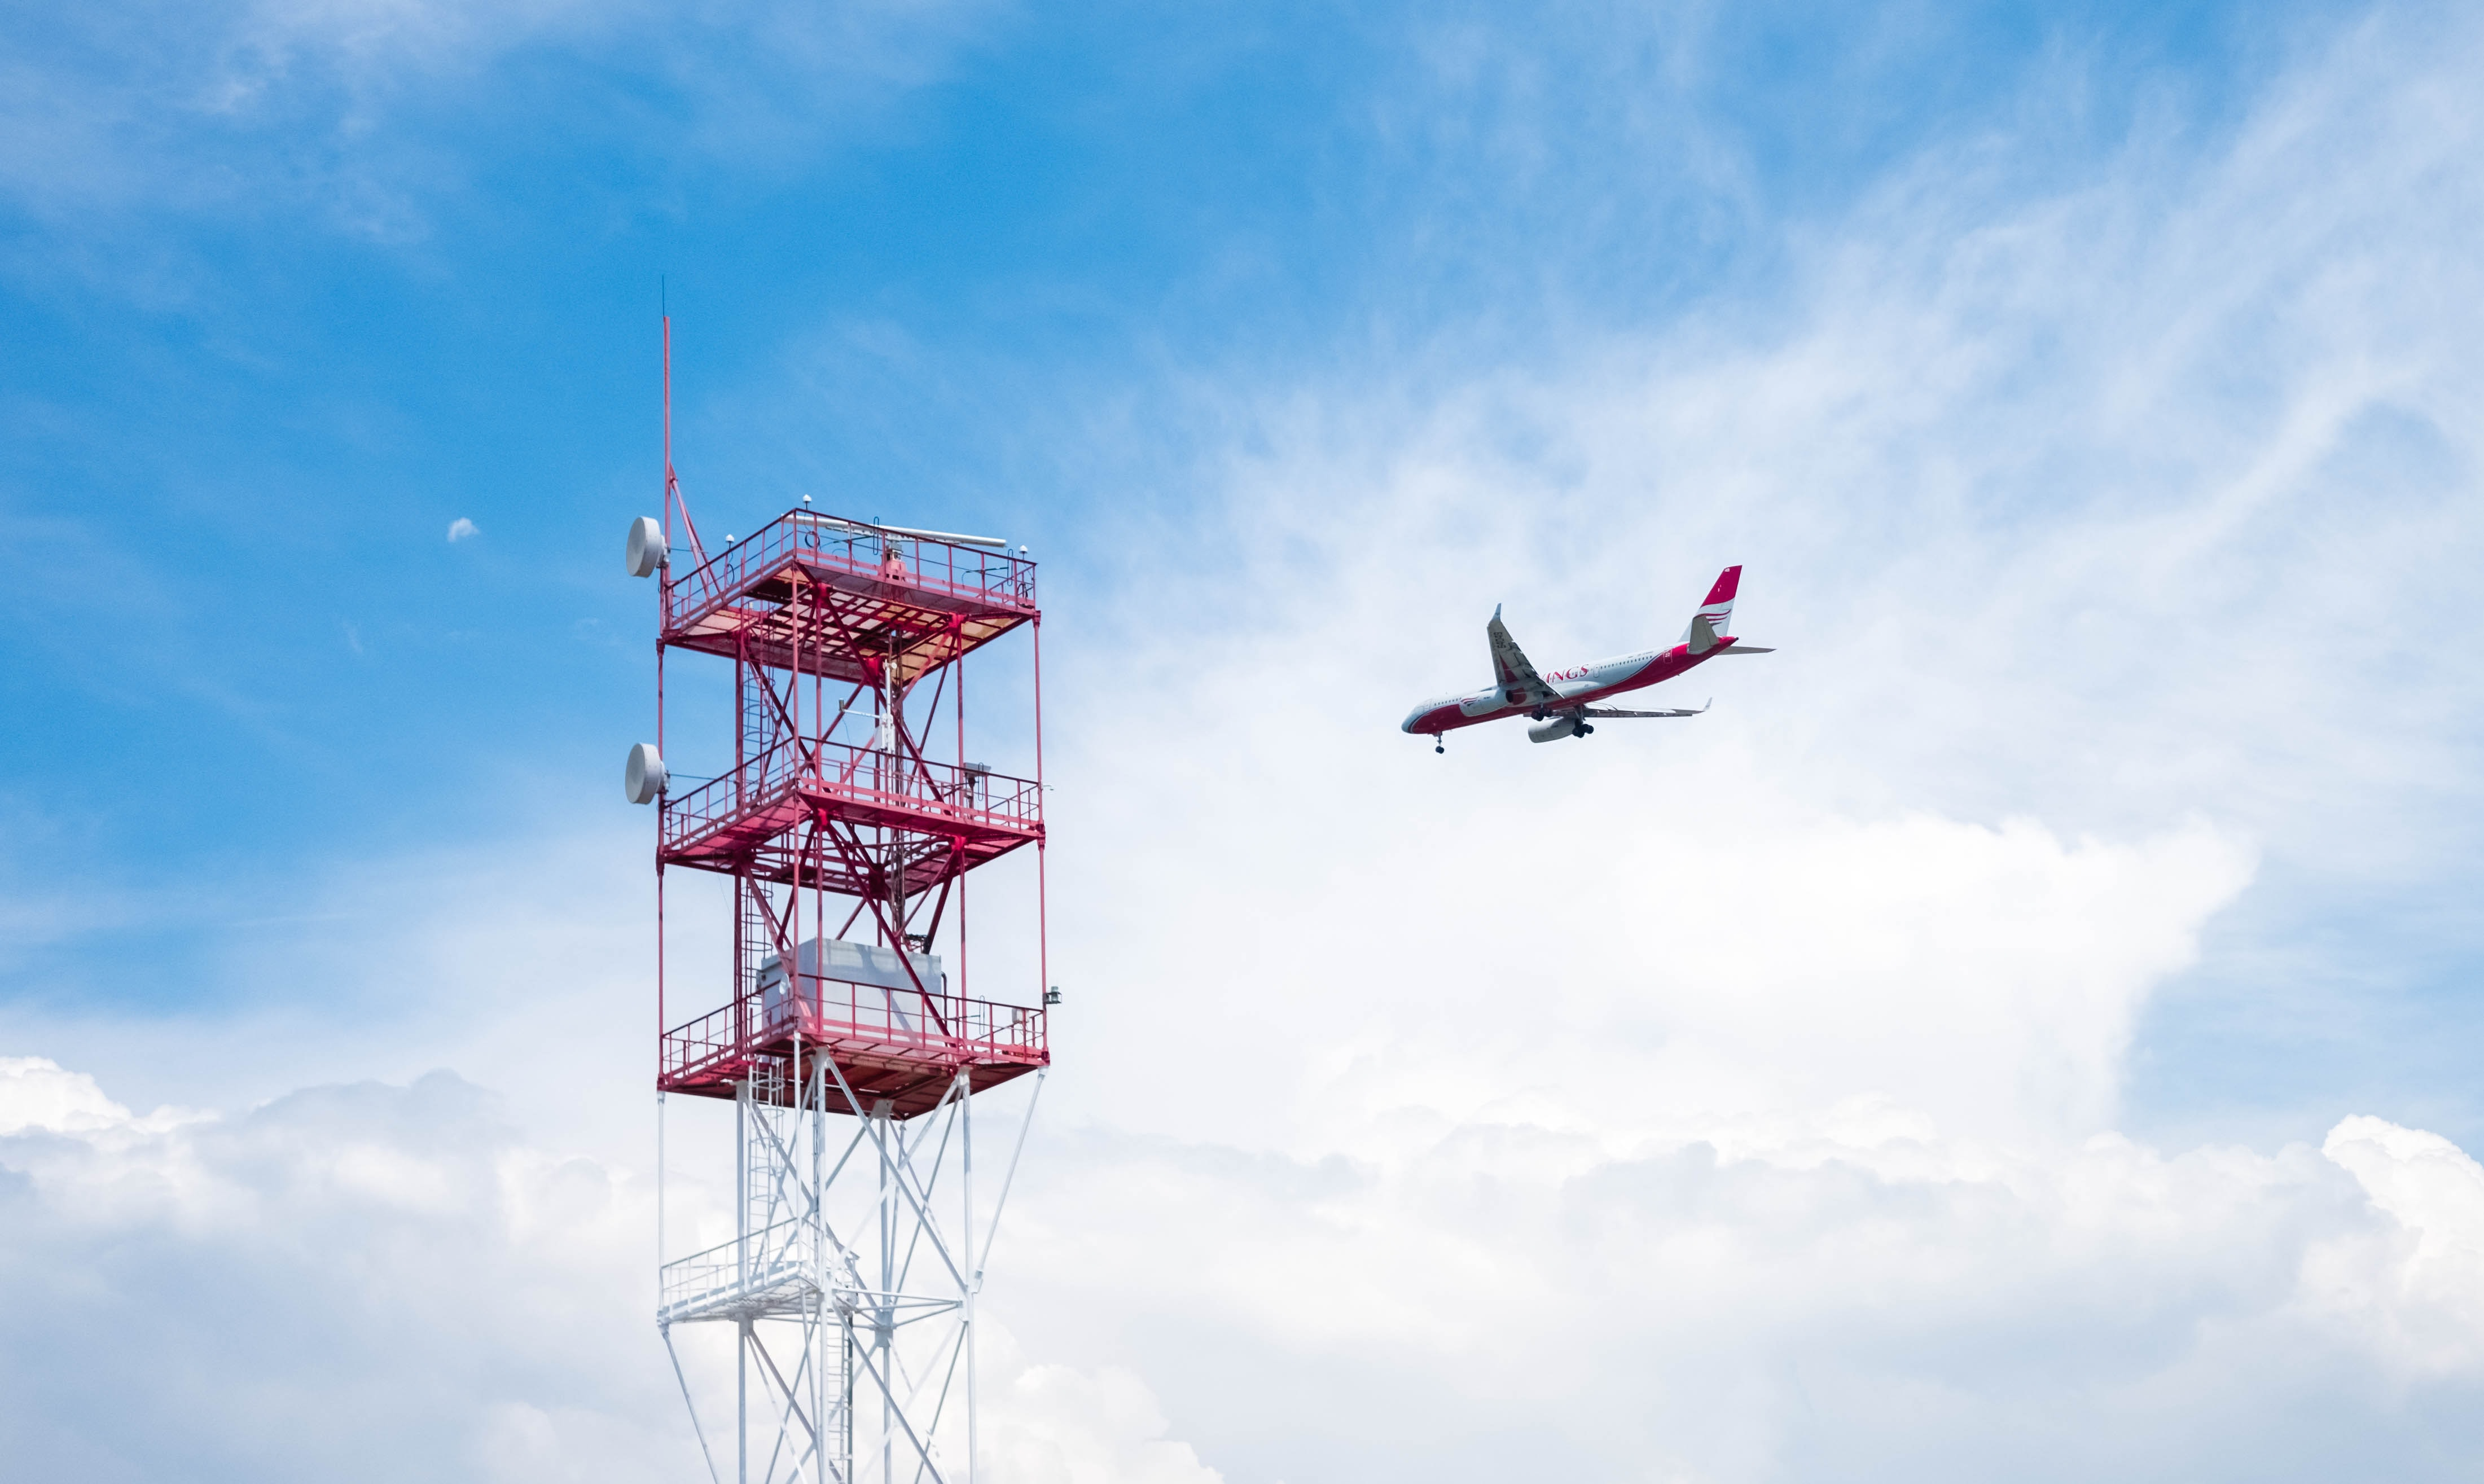 flight aircraft beside satellite